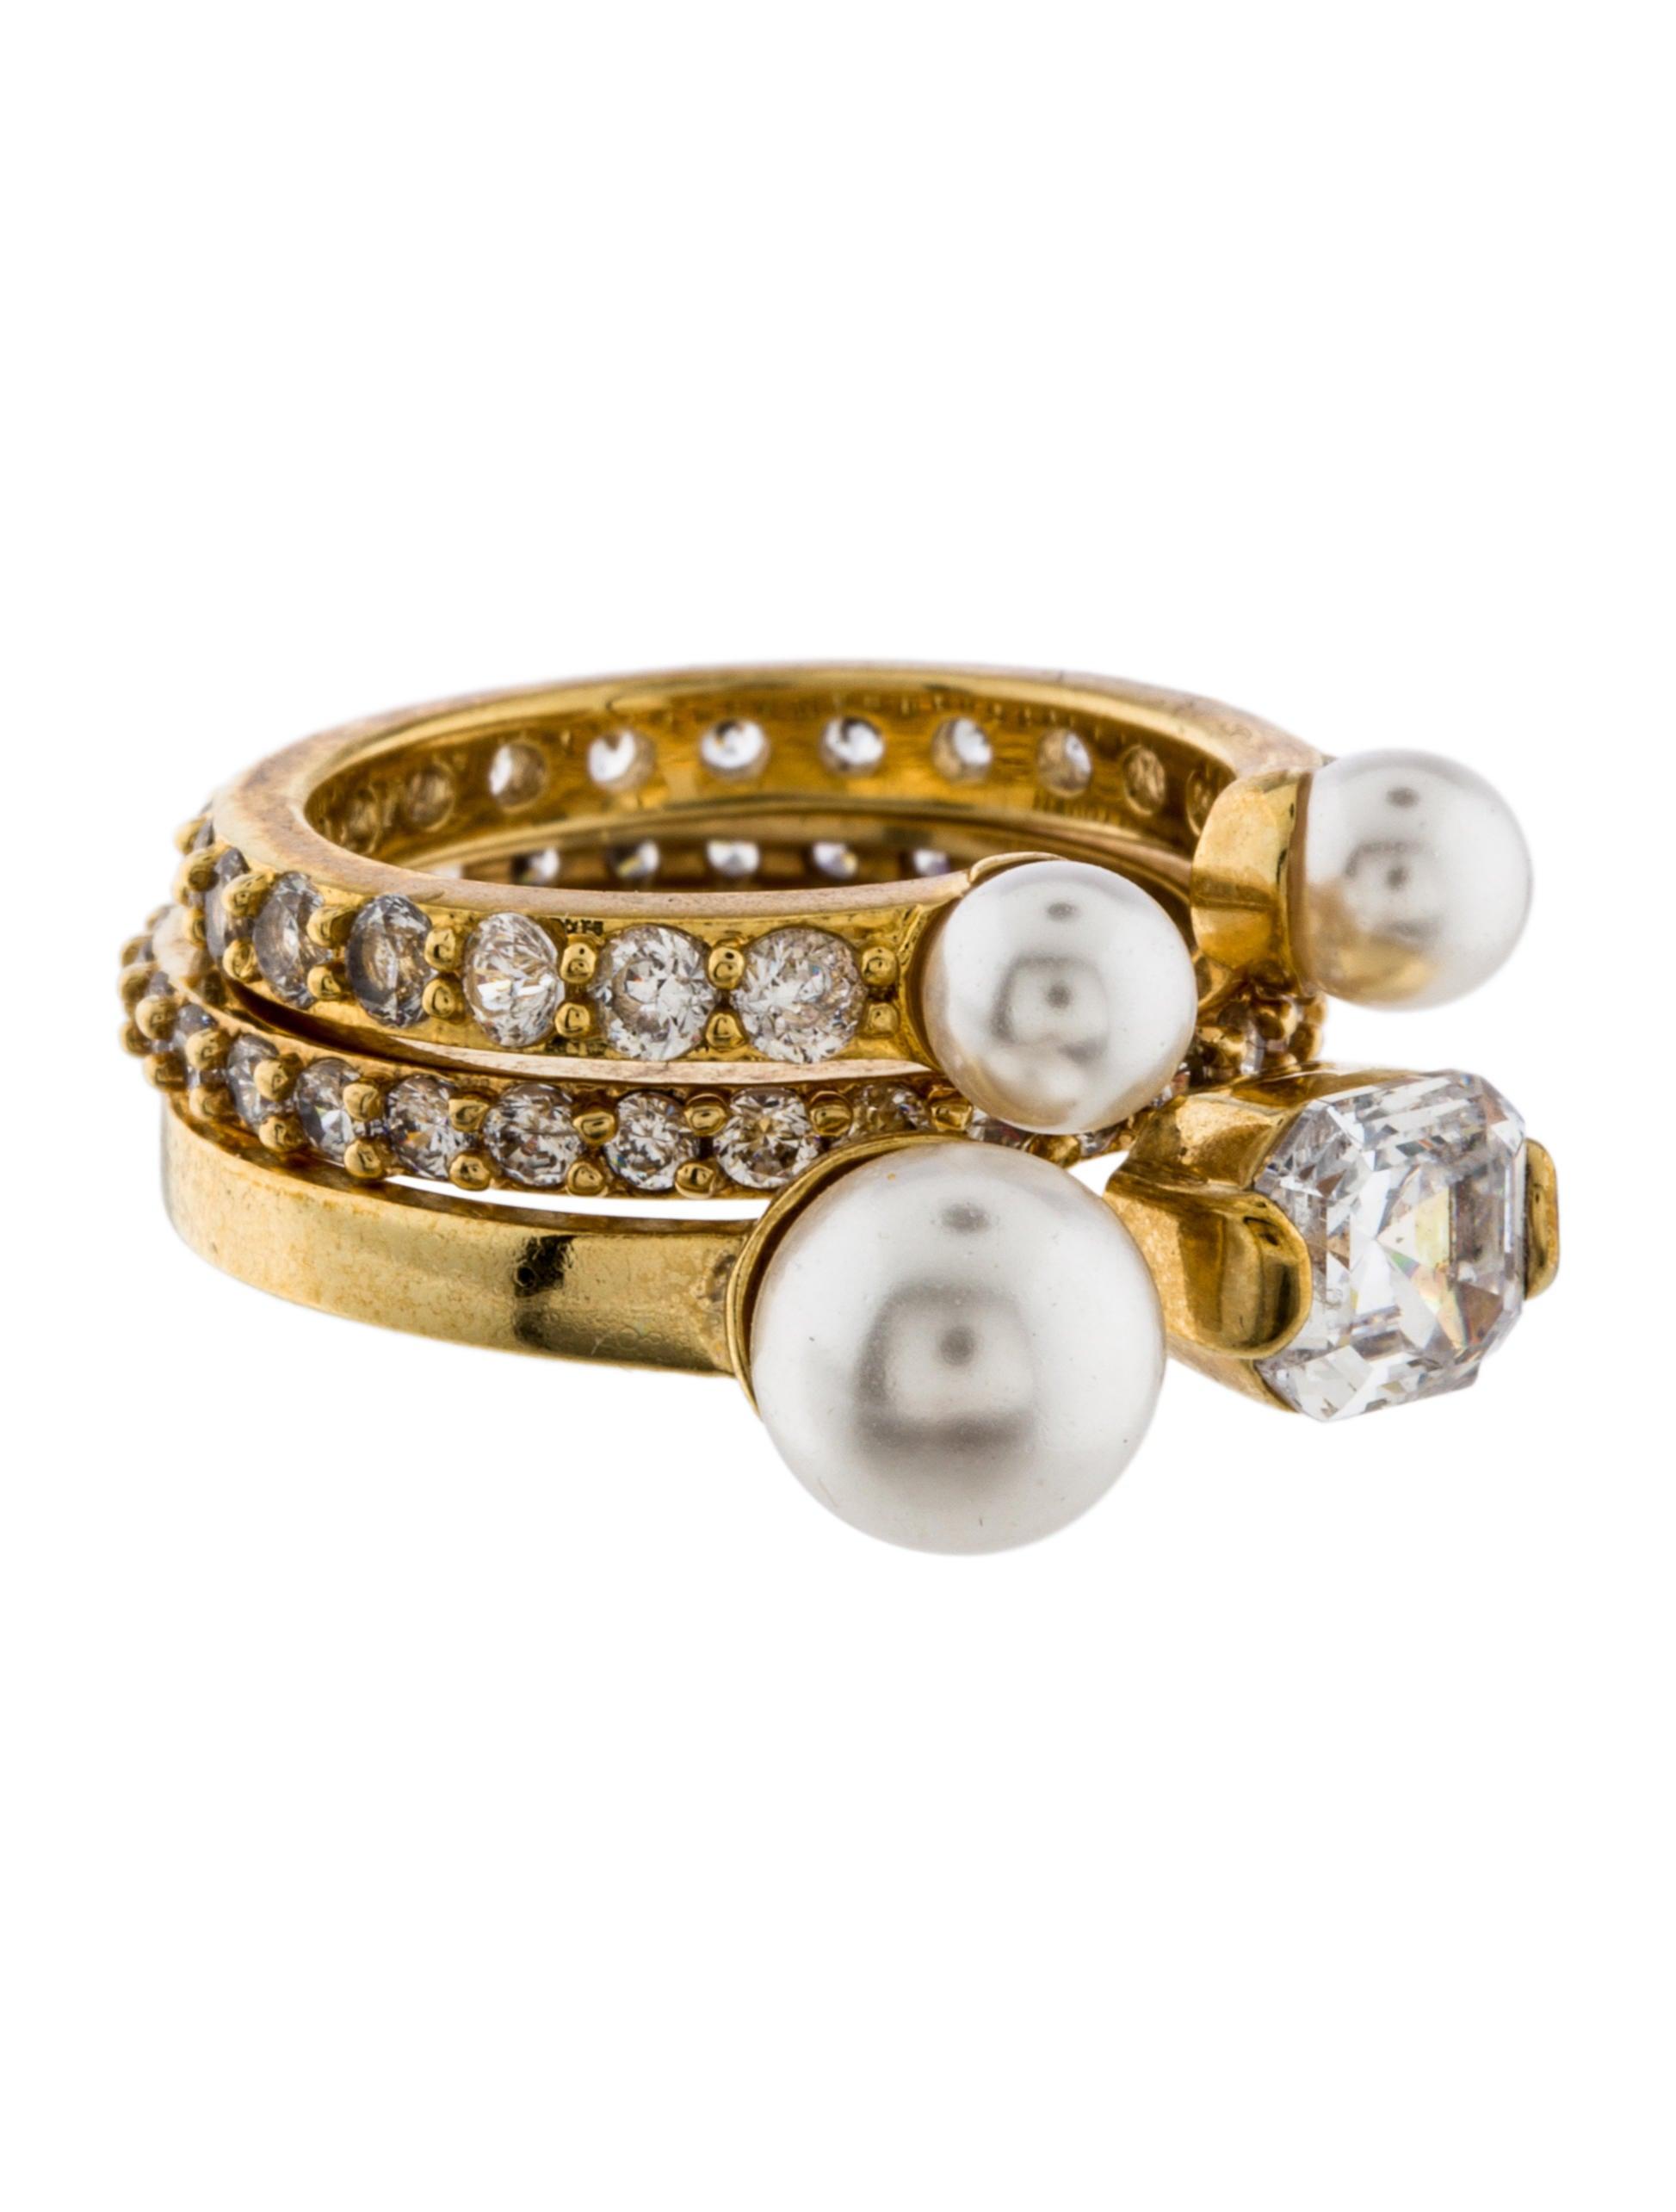 henri bendel midi pearl ring set rings whenb20041. Black Bedroom Furniture Sets. Home Design Ideas